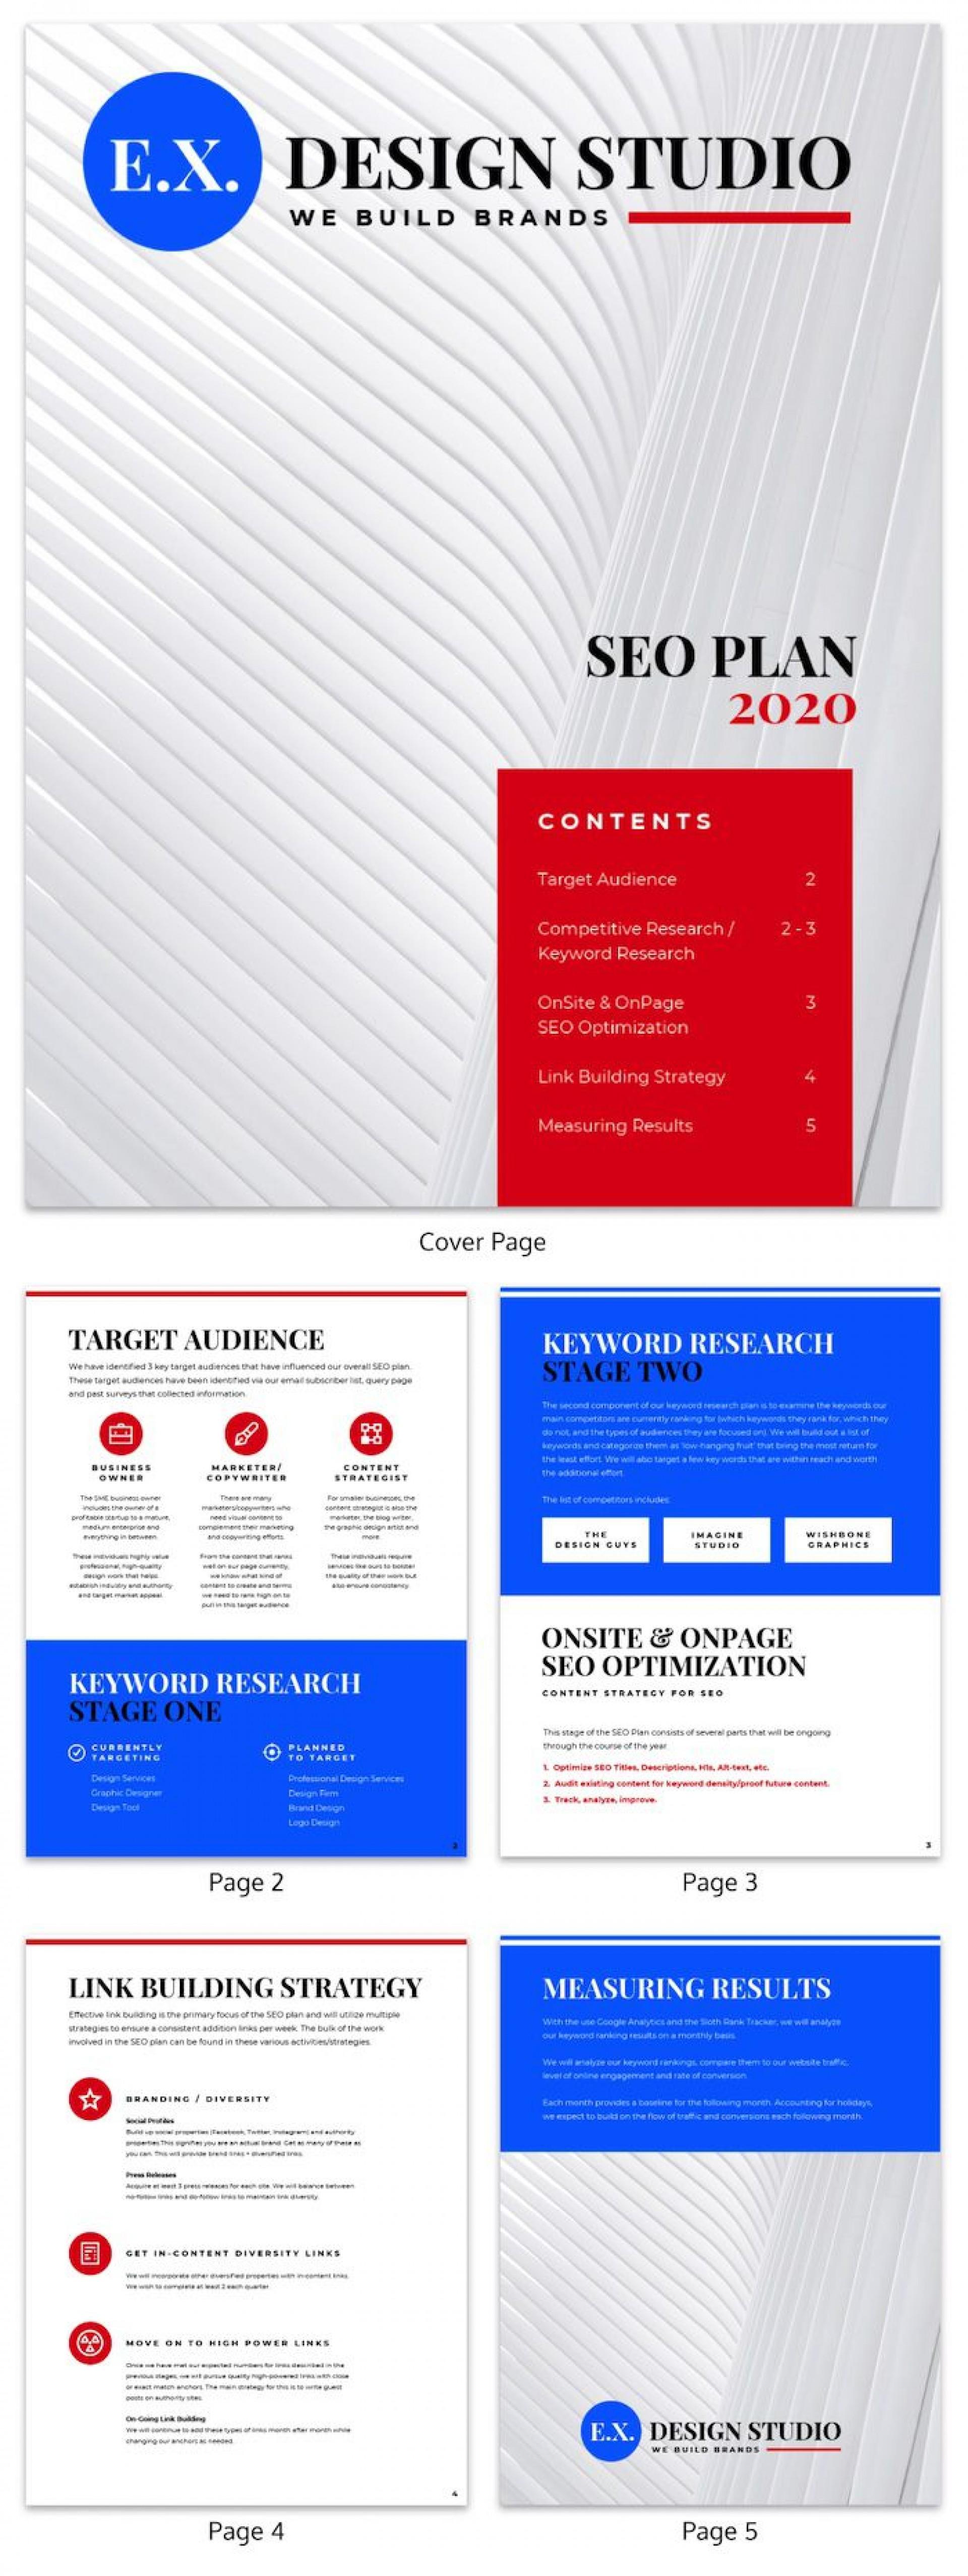 006 Fascinating Social Media Marketing Plan Template 2018 High Definition 1920